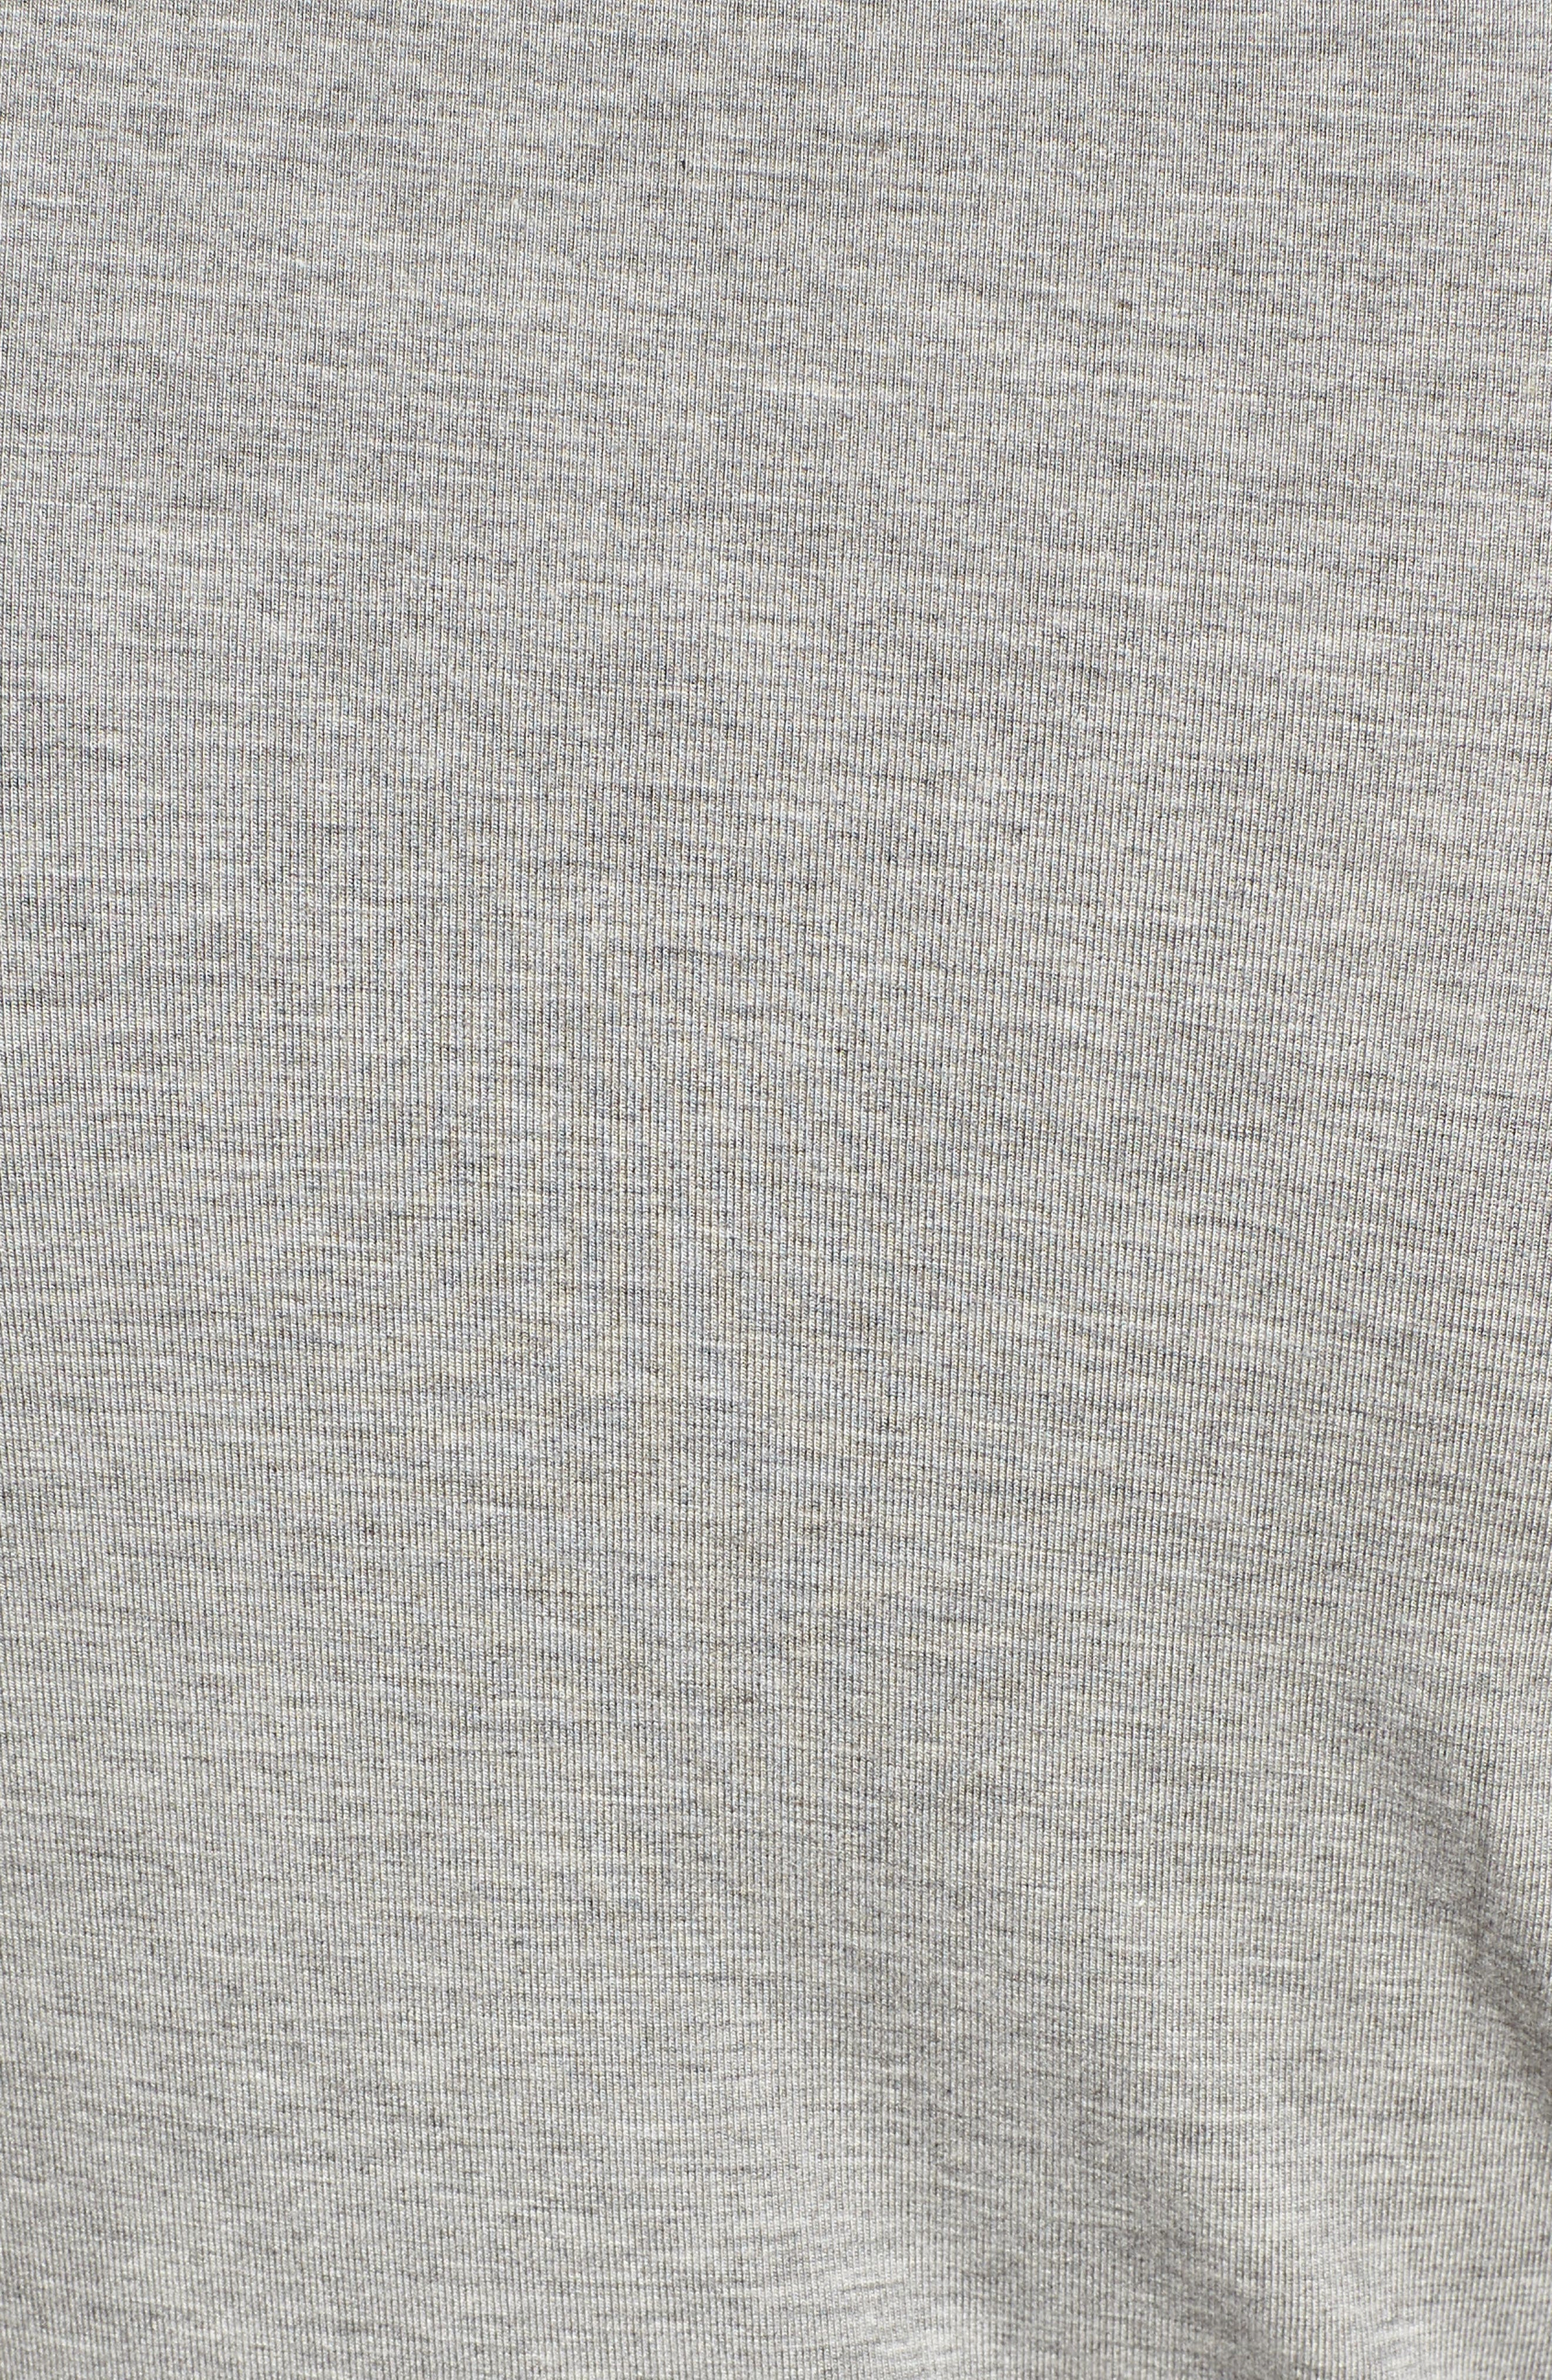 'Deneuve' Cold Shoulder Top,                             Alternate thumbnail 5, color,                             032